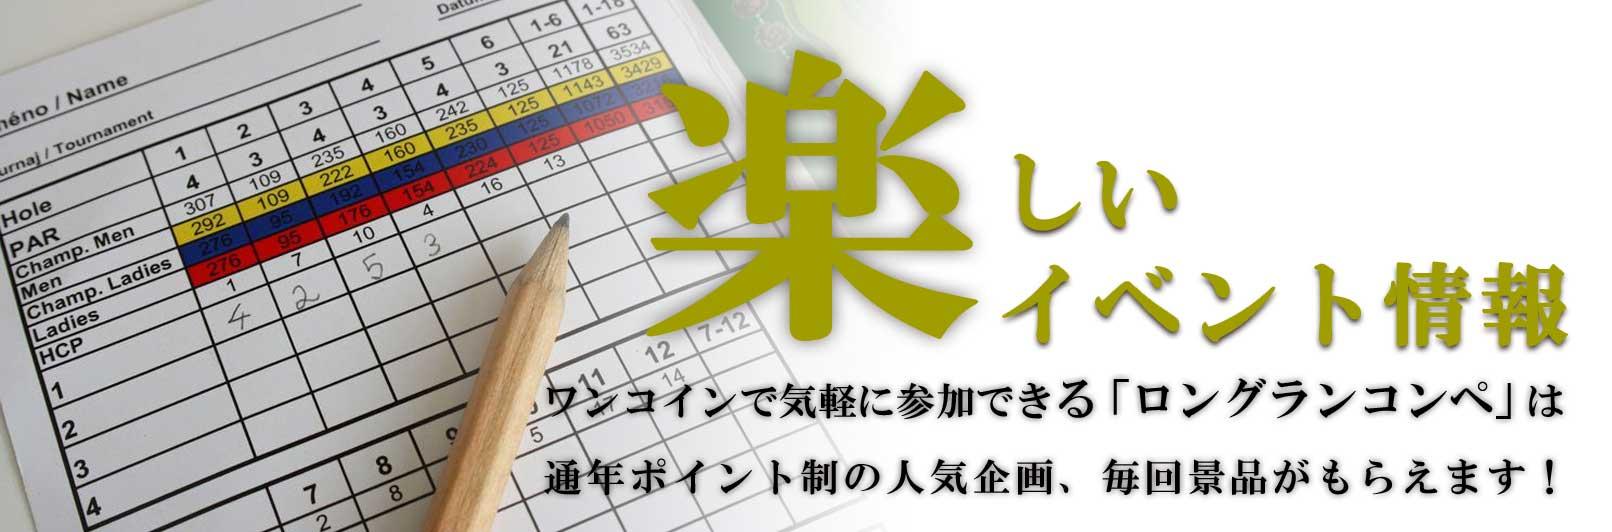 asahikawa_top_event